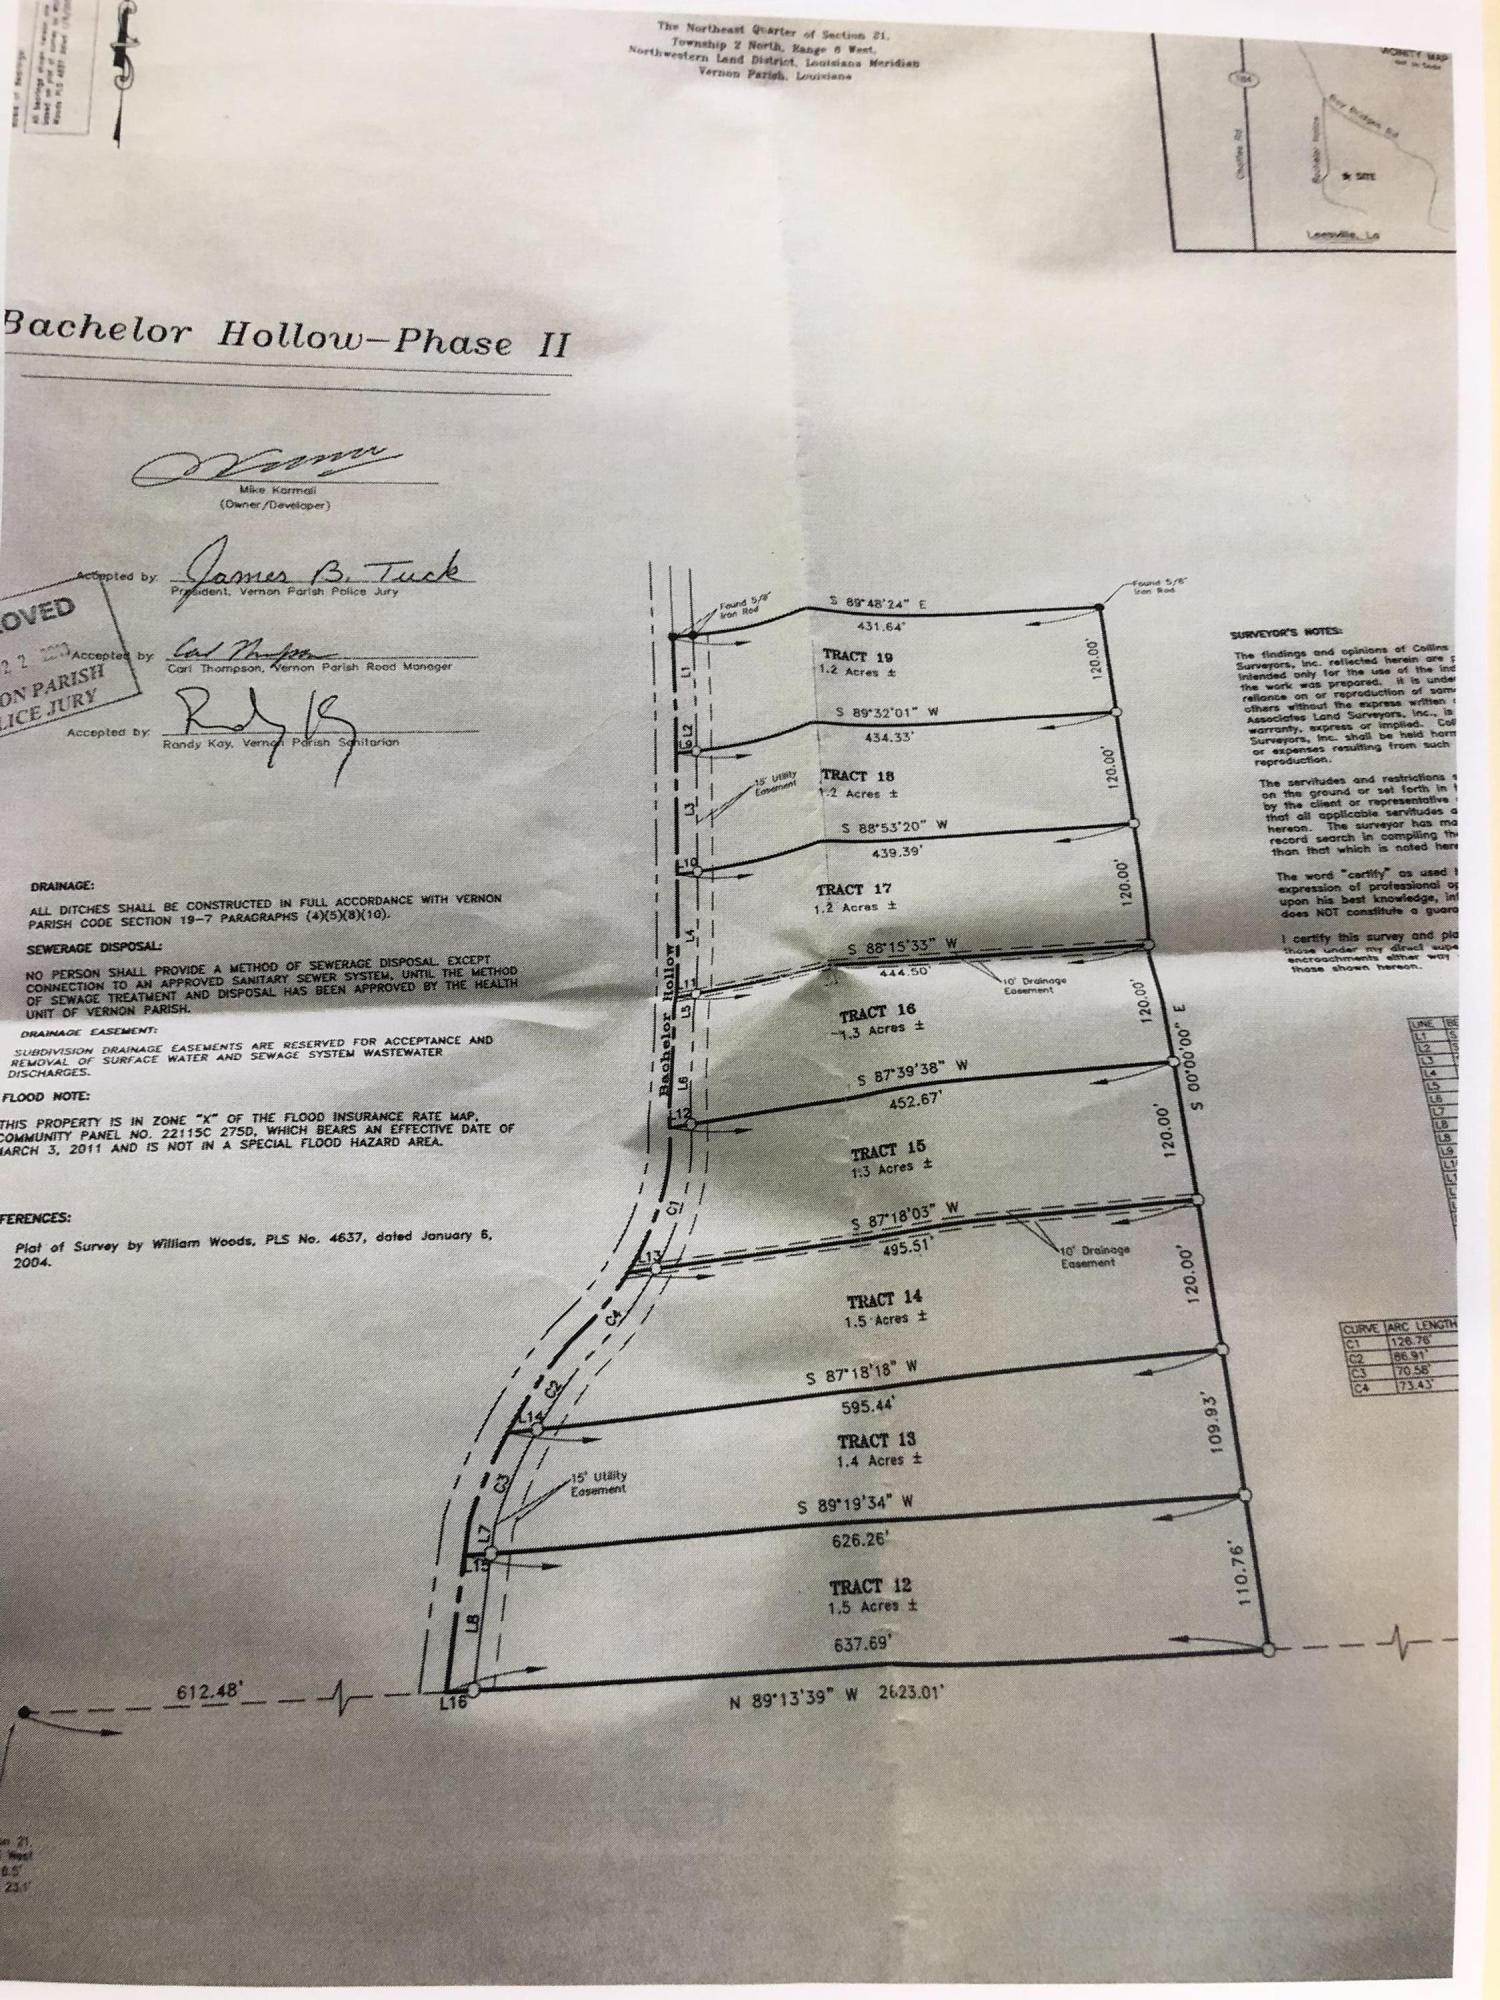 Leesville land for sale,  Bachelor Hollow Lot 12, Leesville LA - $21,900